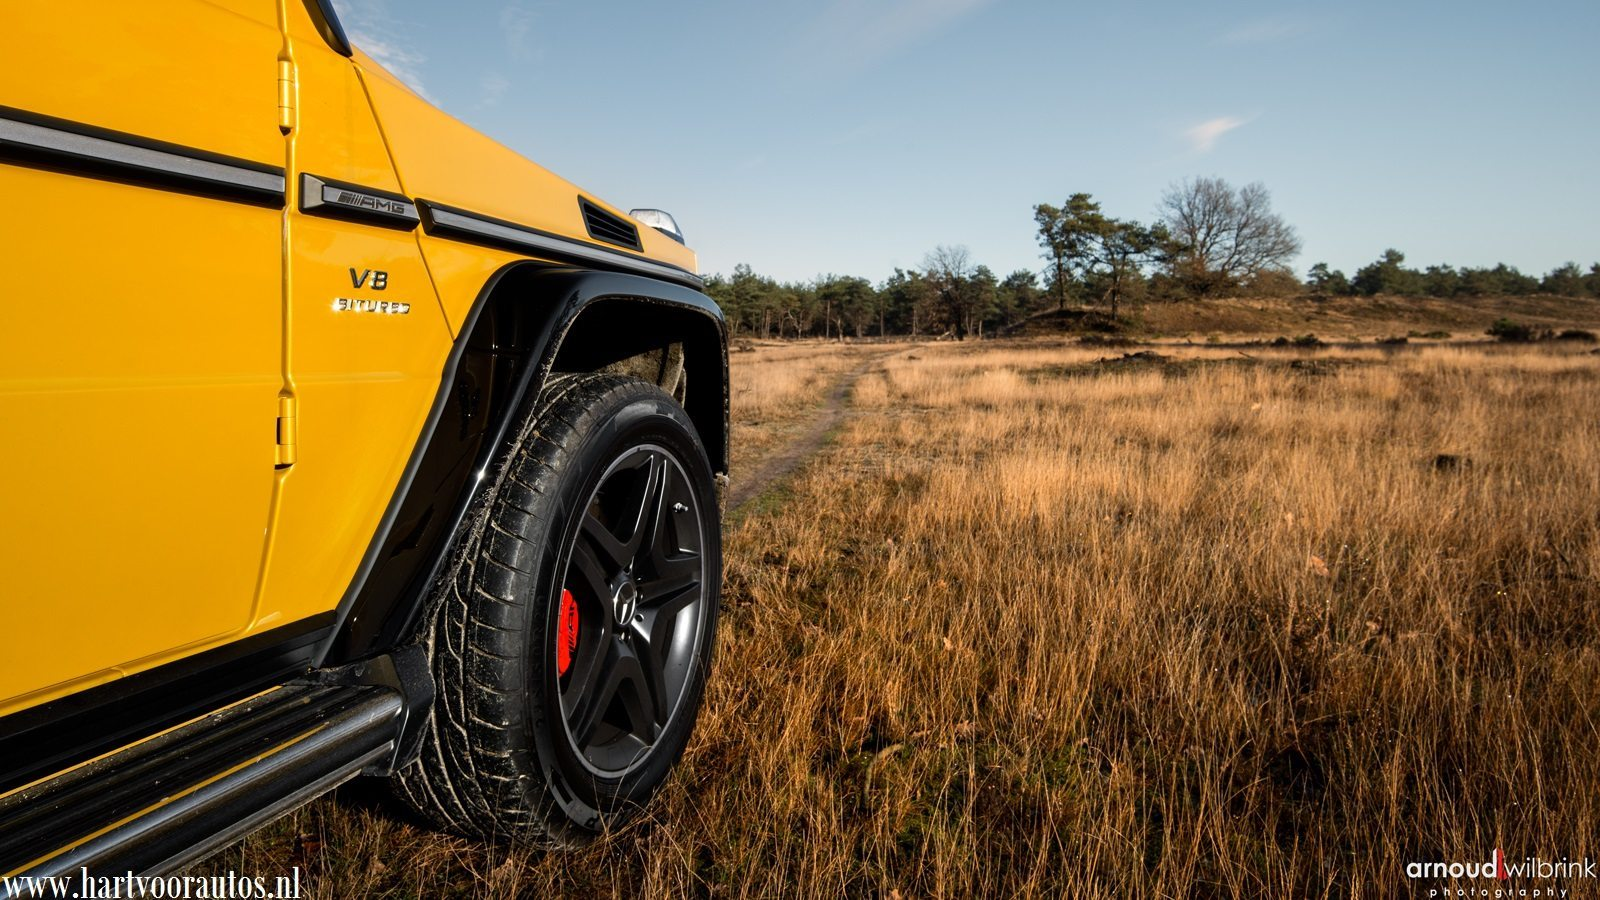 Mercedes-Benz G 63 AMG - Hartvoorautos.nl